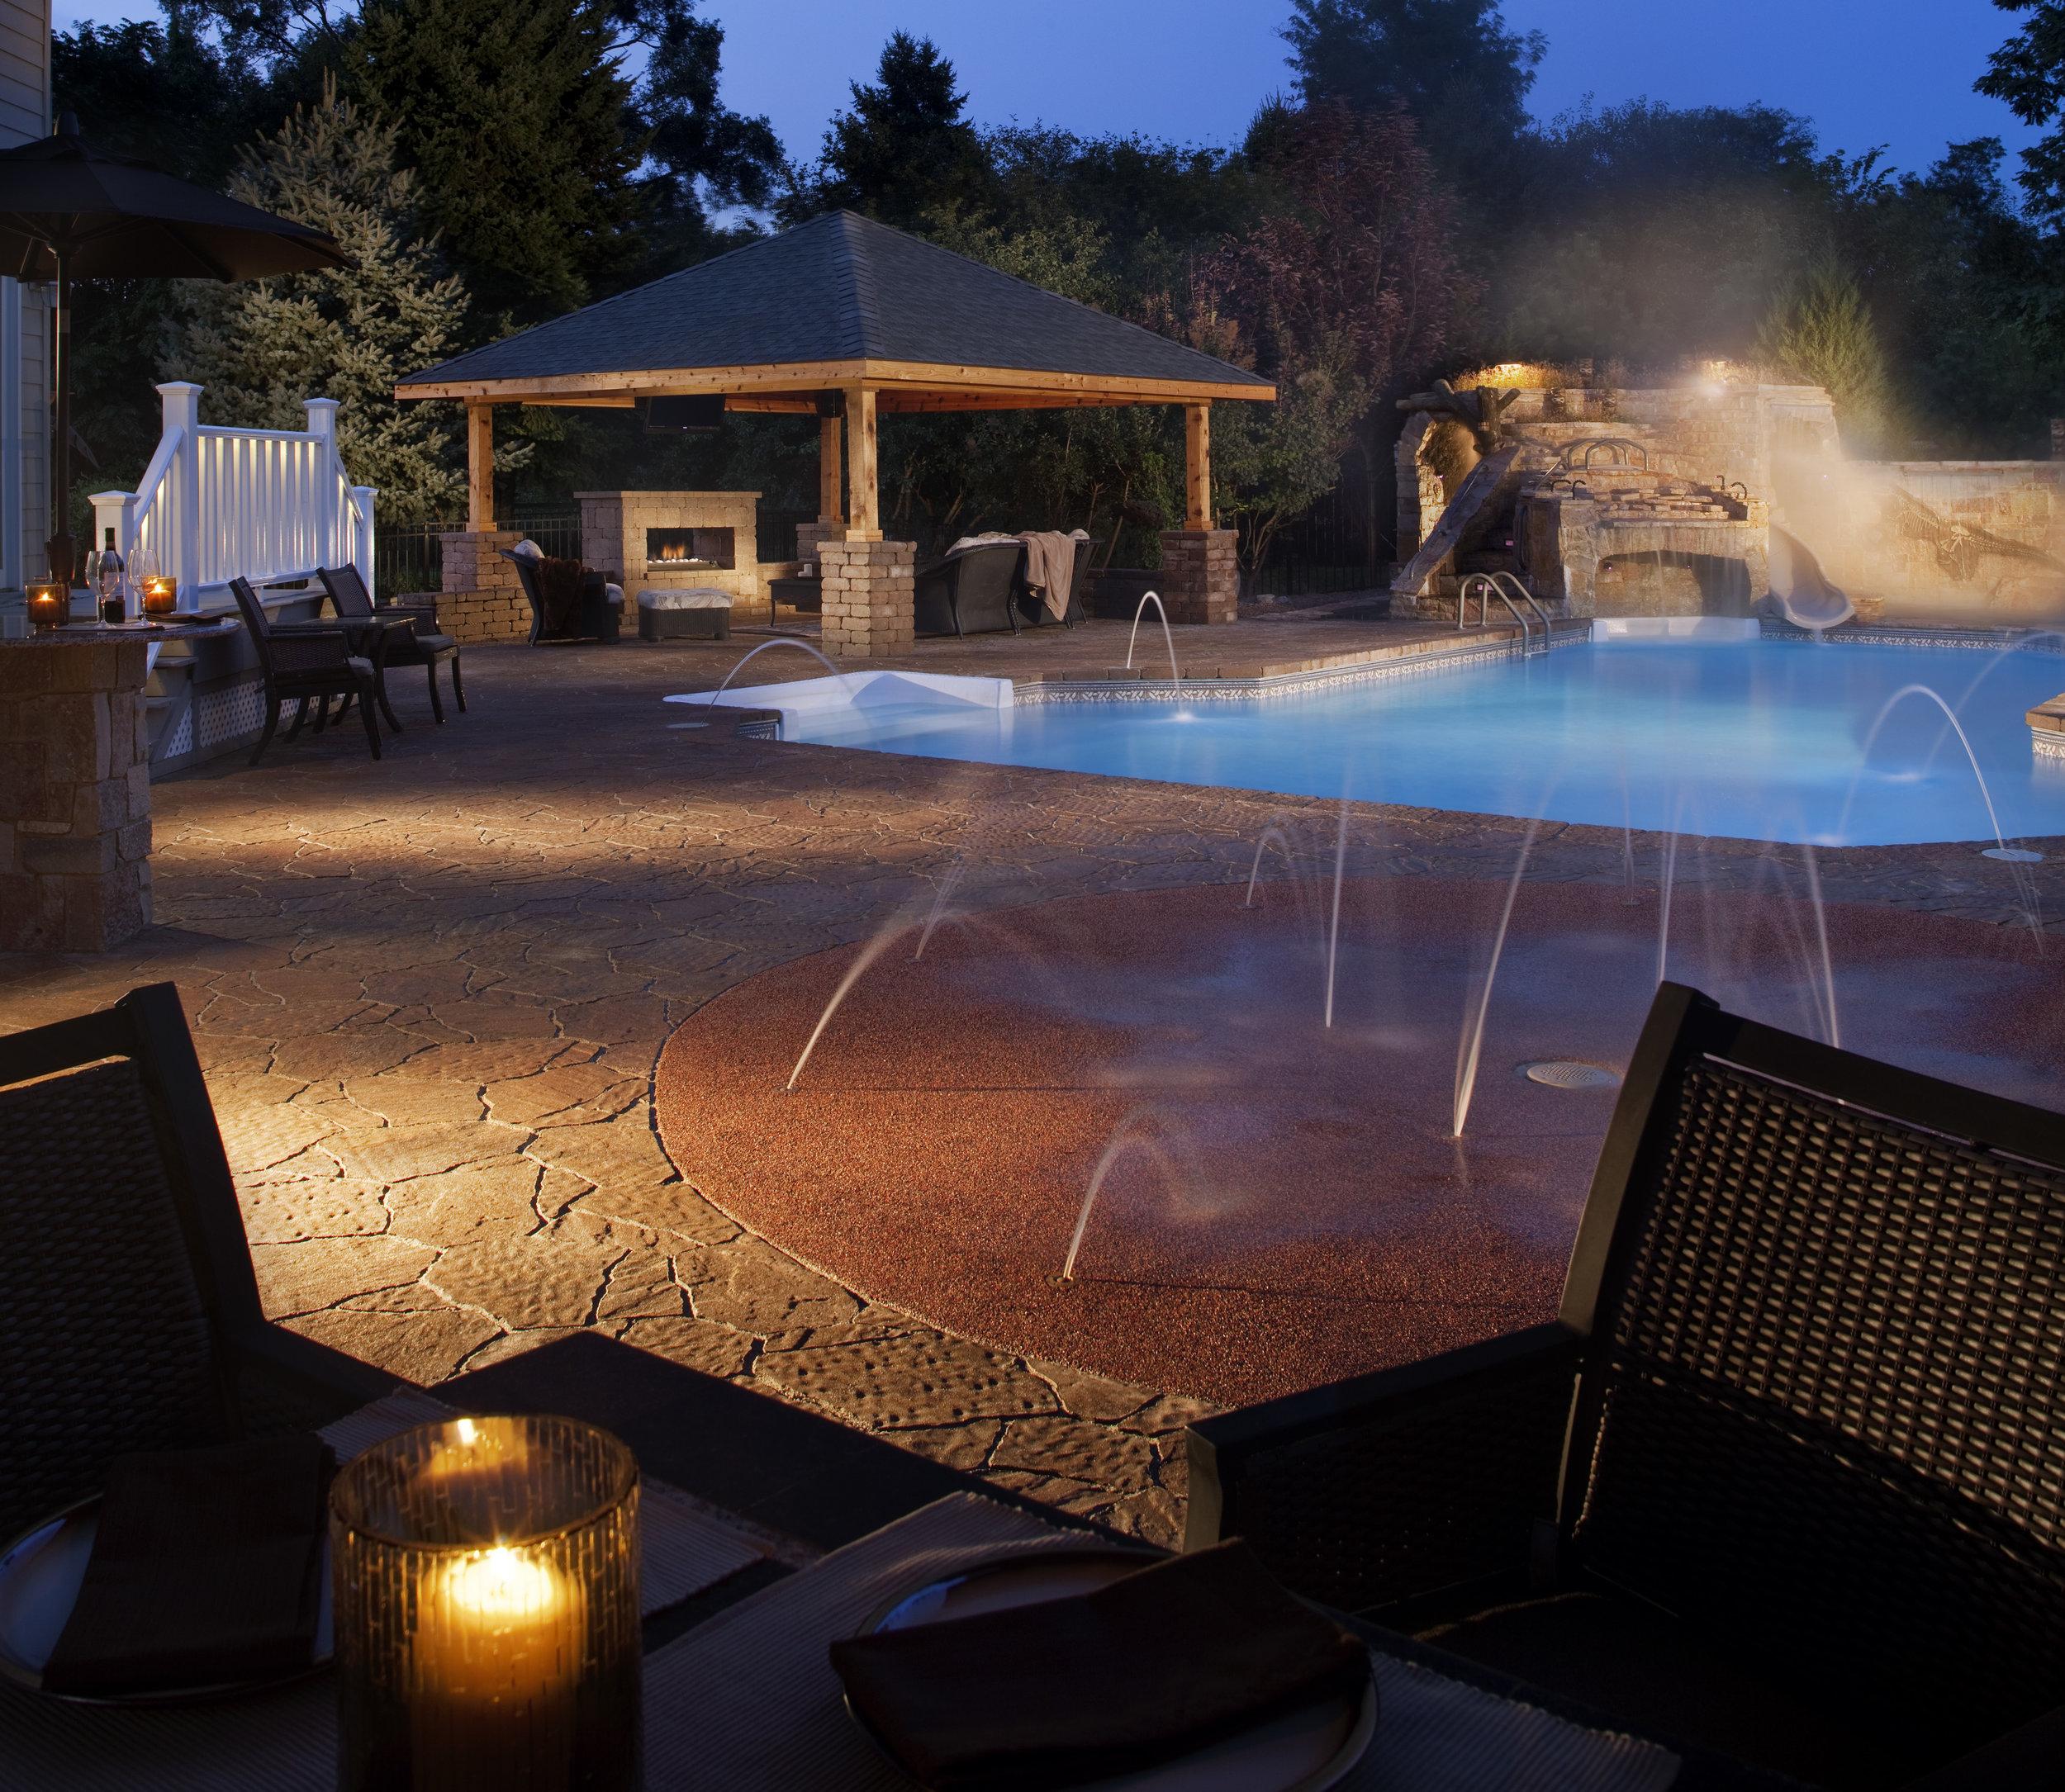 waterfall water slide splash pad patio backyard pavilion outdoor room outdoor lights